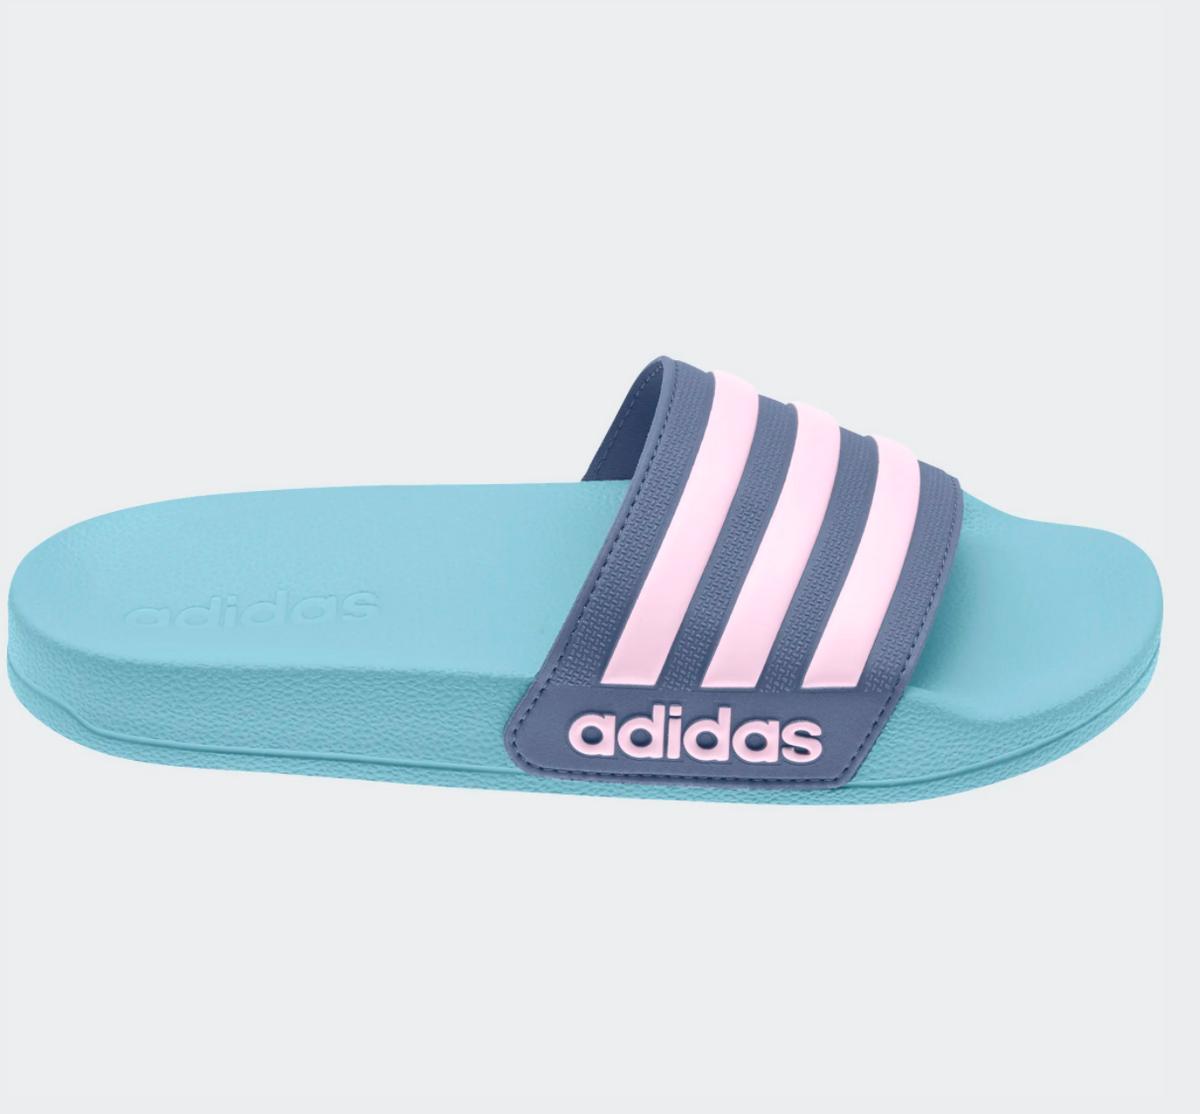 Turkis/Blå Adidas Adilette Sandaler